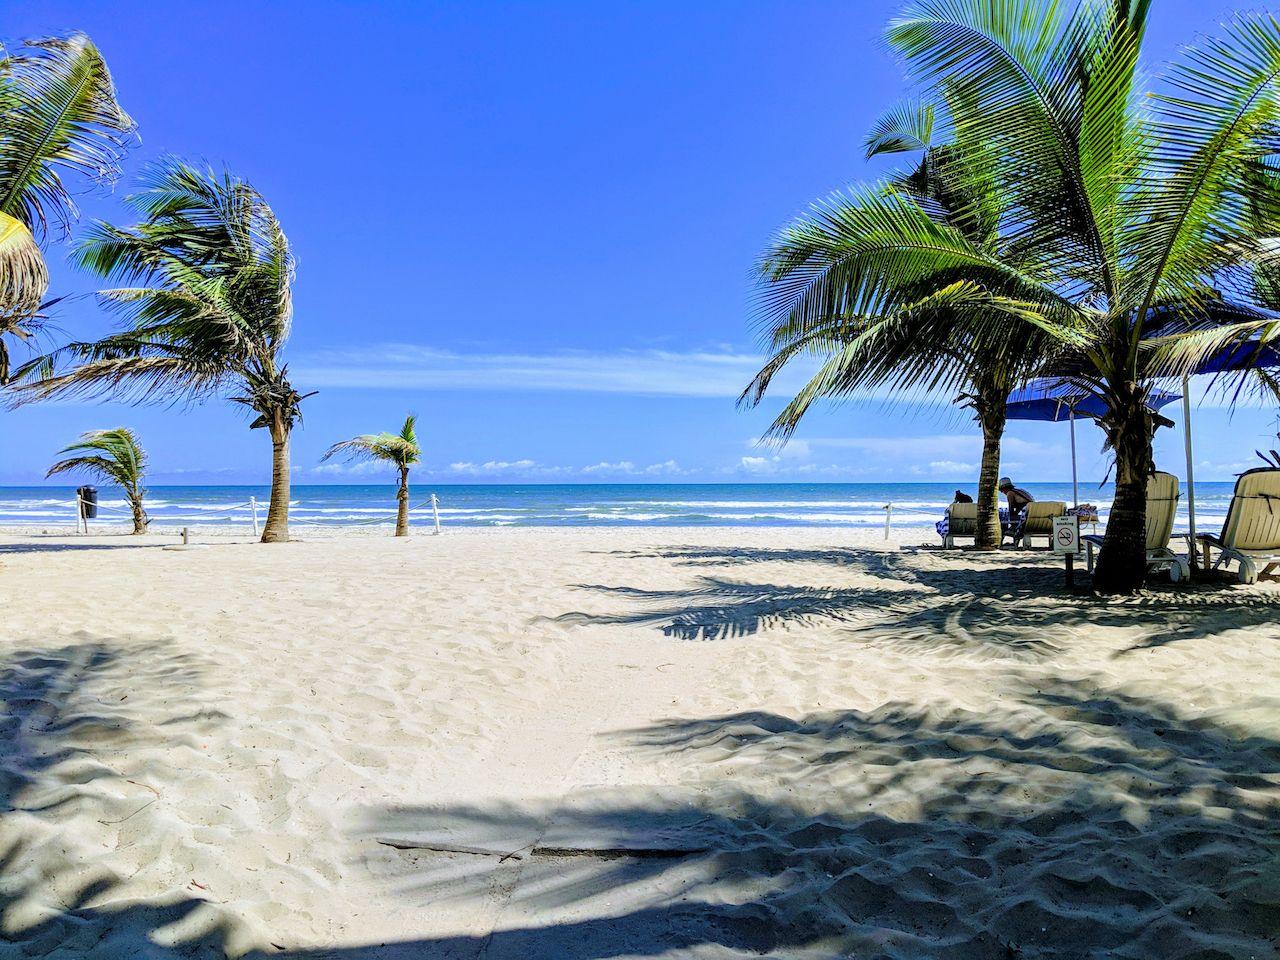 Labadi Beach in Accra, Ghana